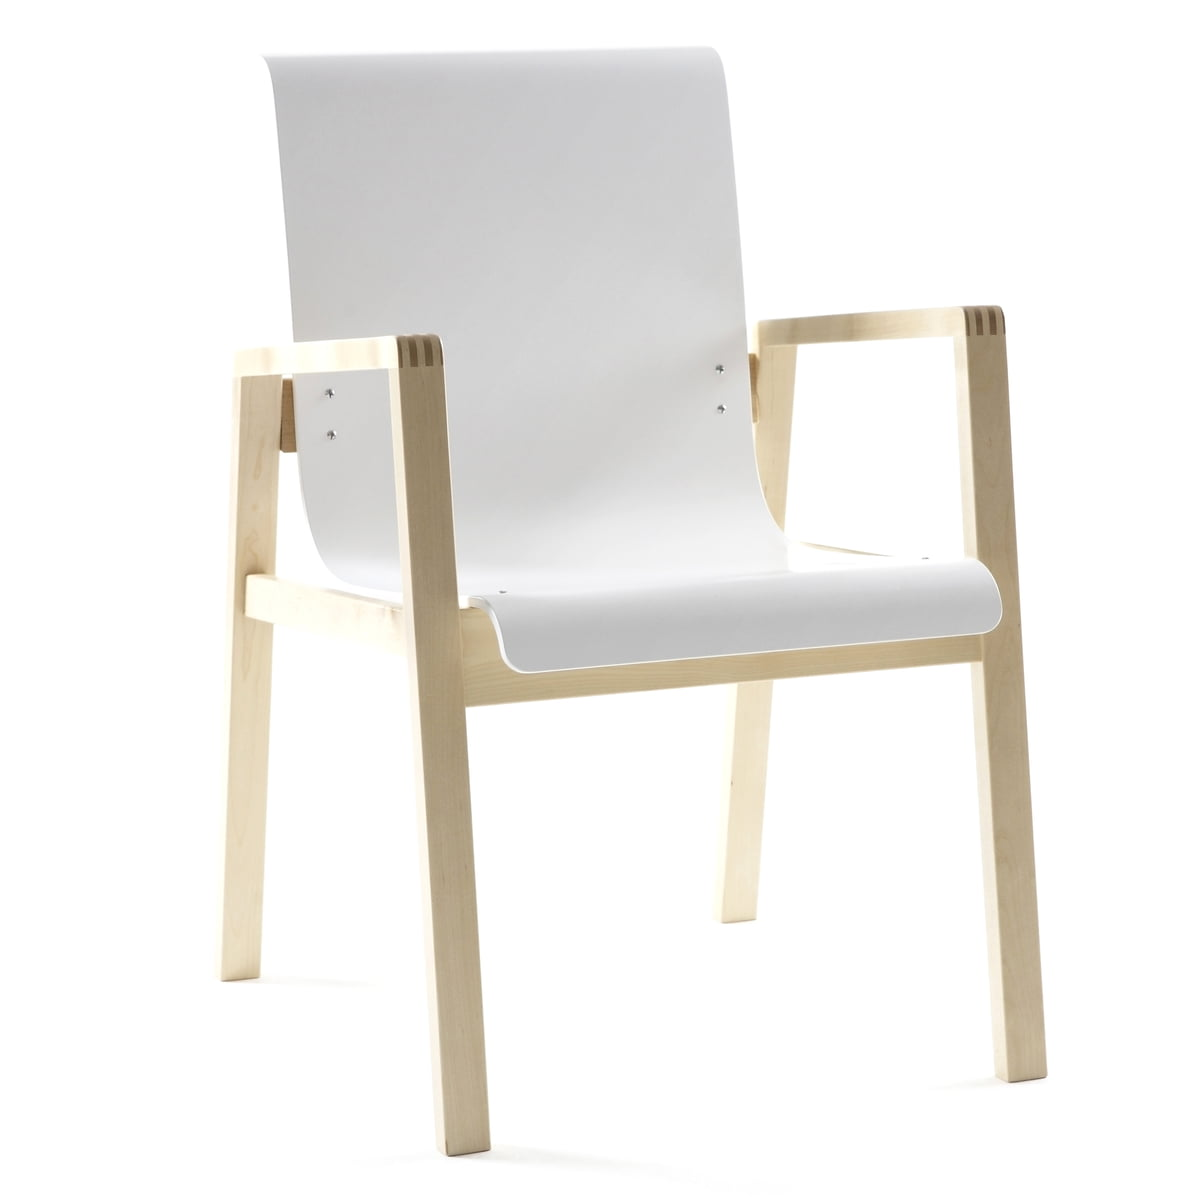 hallway armchair 403 artek shop. Black Bedroom Furniture Sets. Home Design Ideas